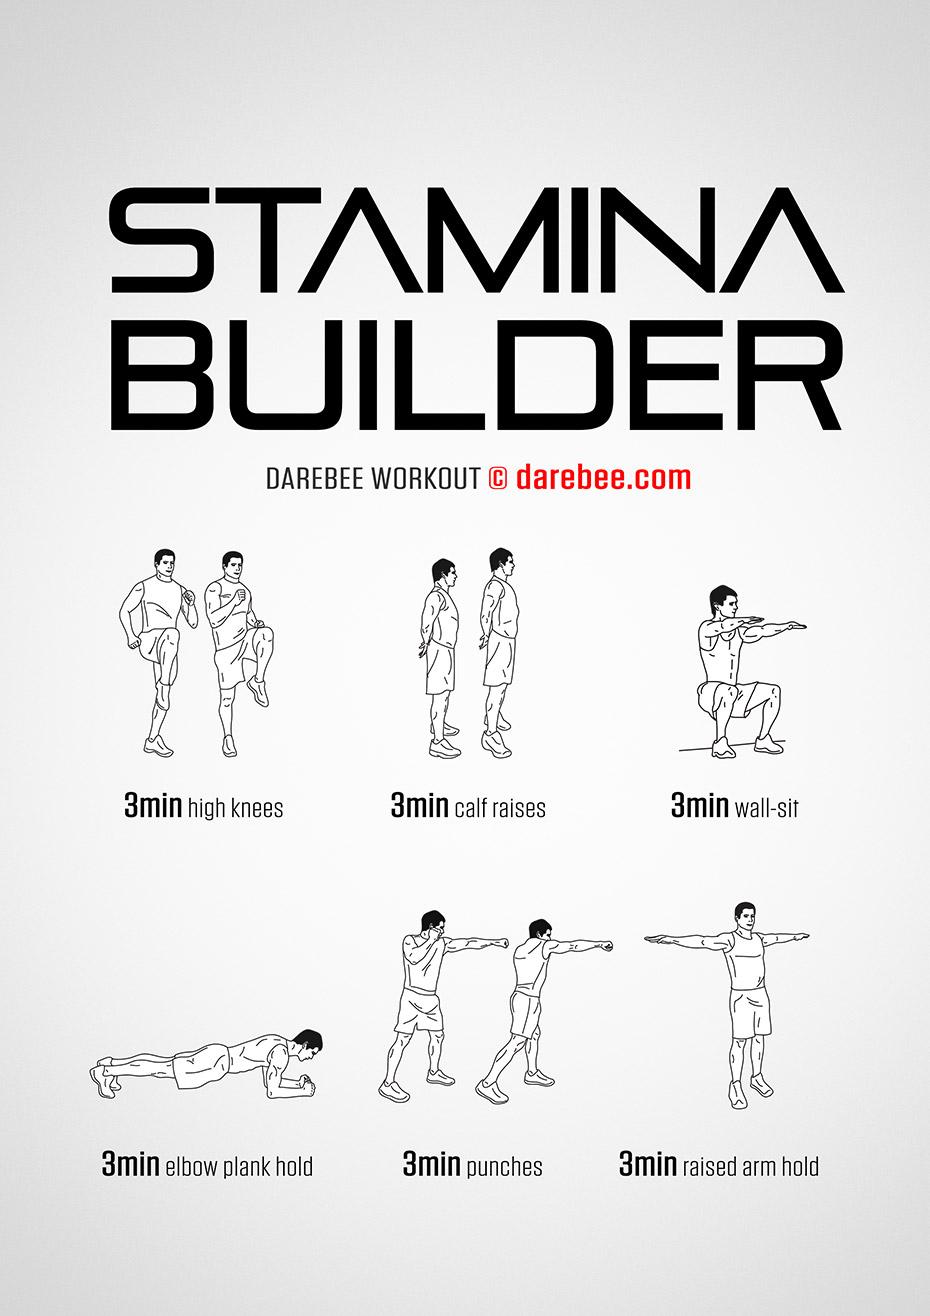 Stamina Builder Workout